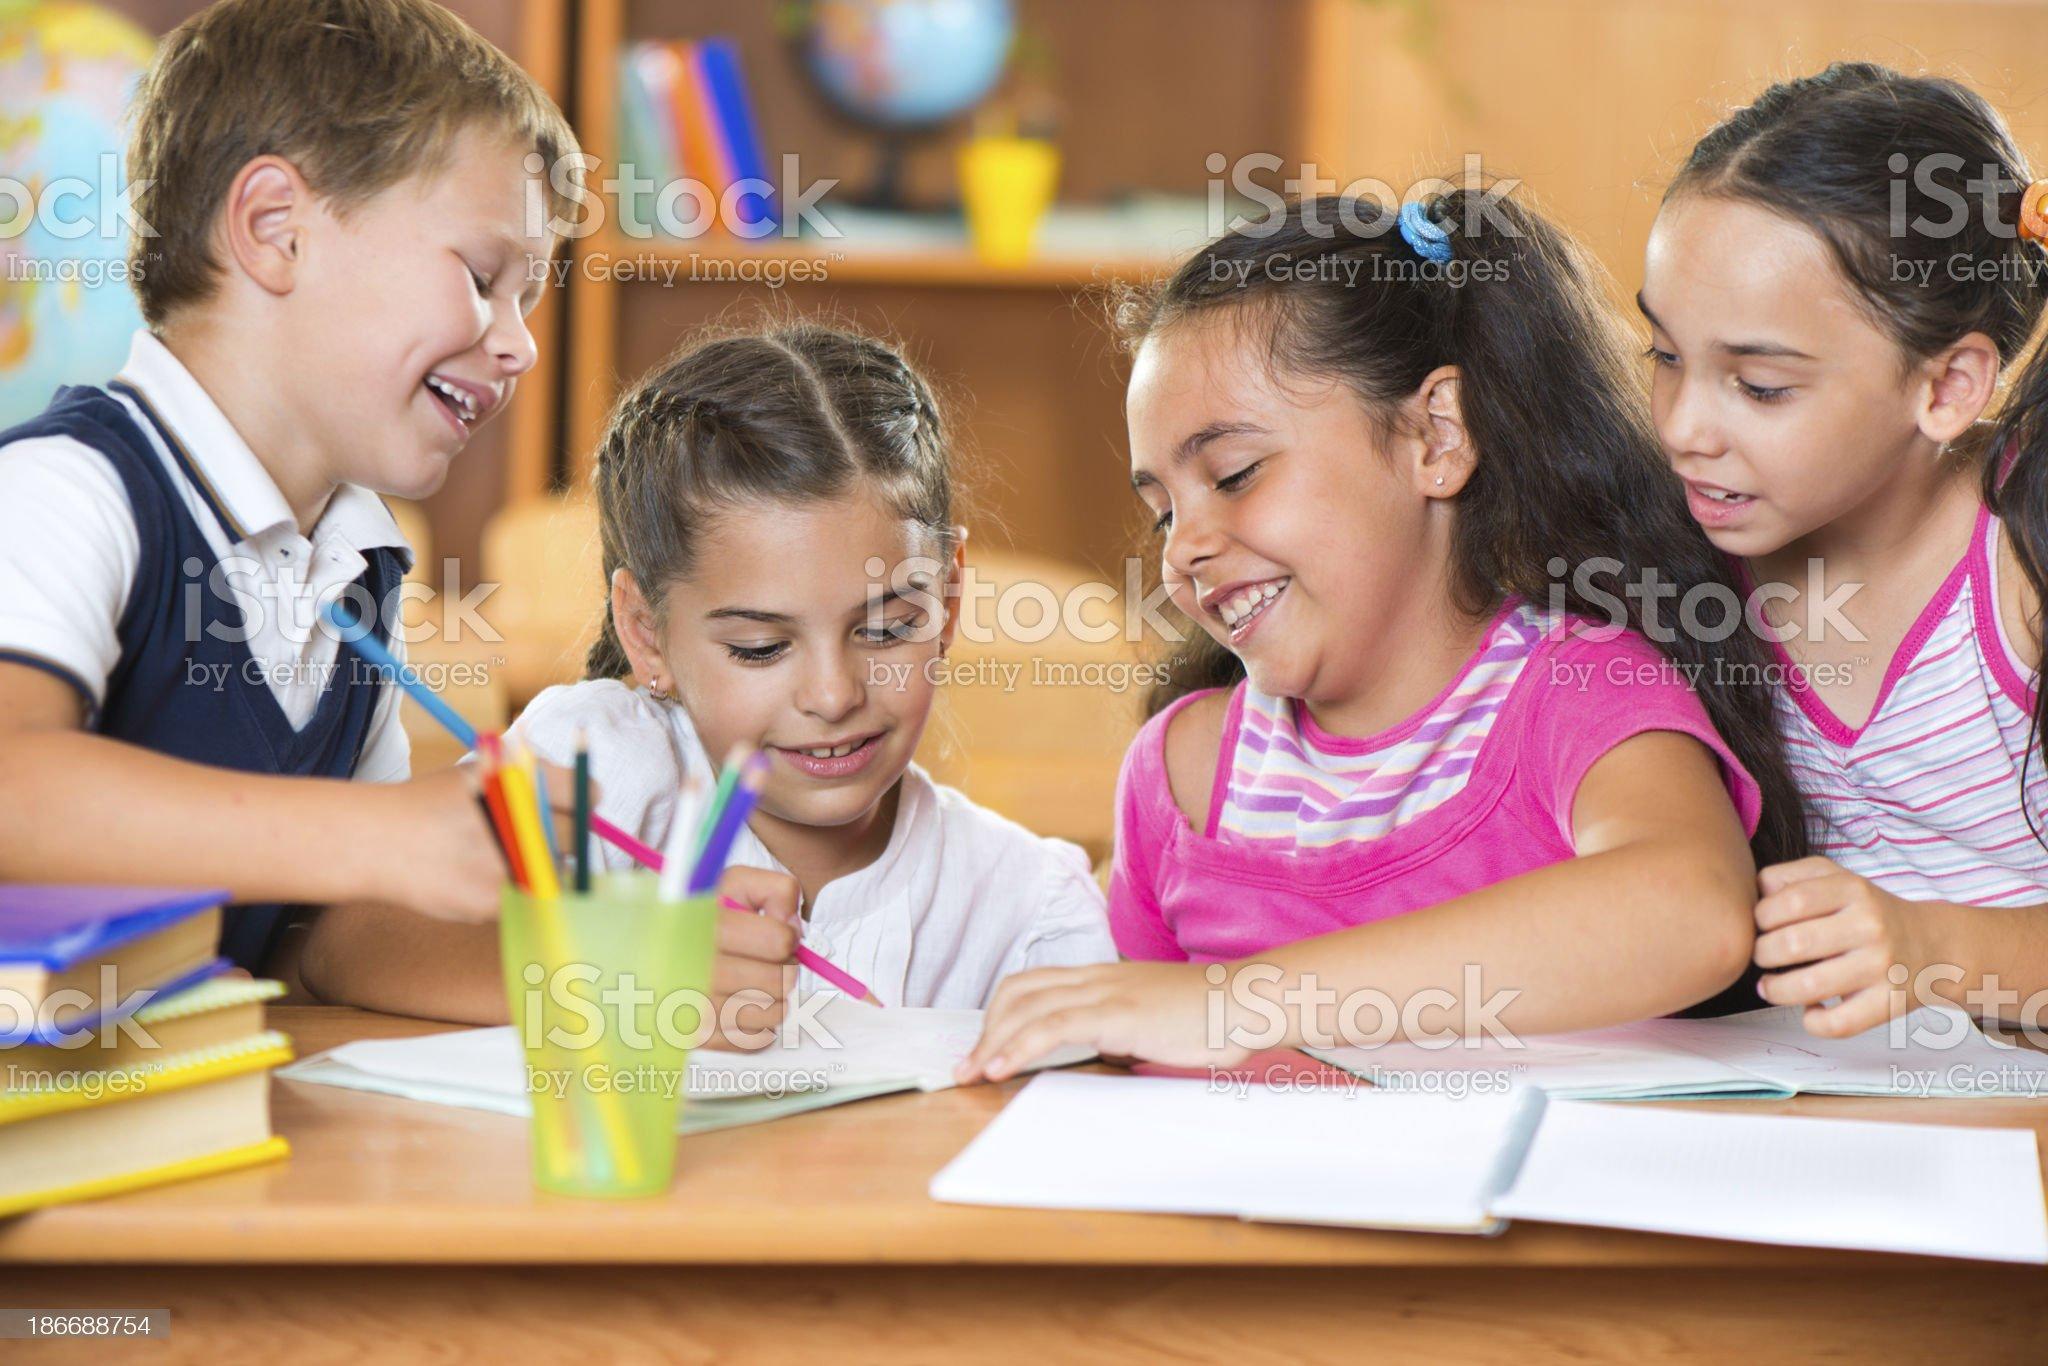 Group of cute schoolchildren having fun in classroom royalty-free stock photo